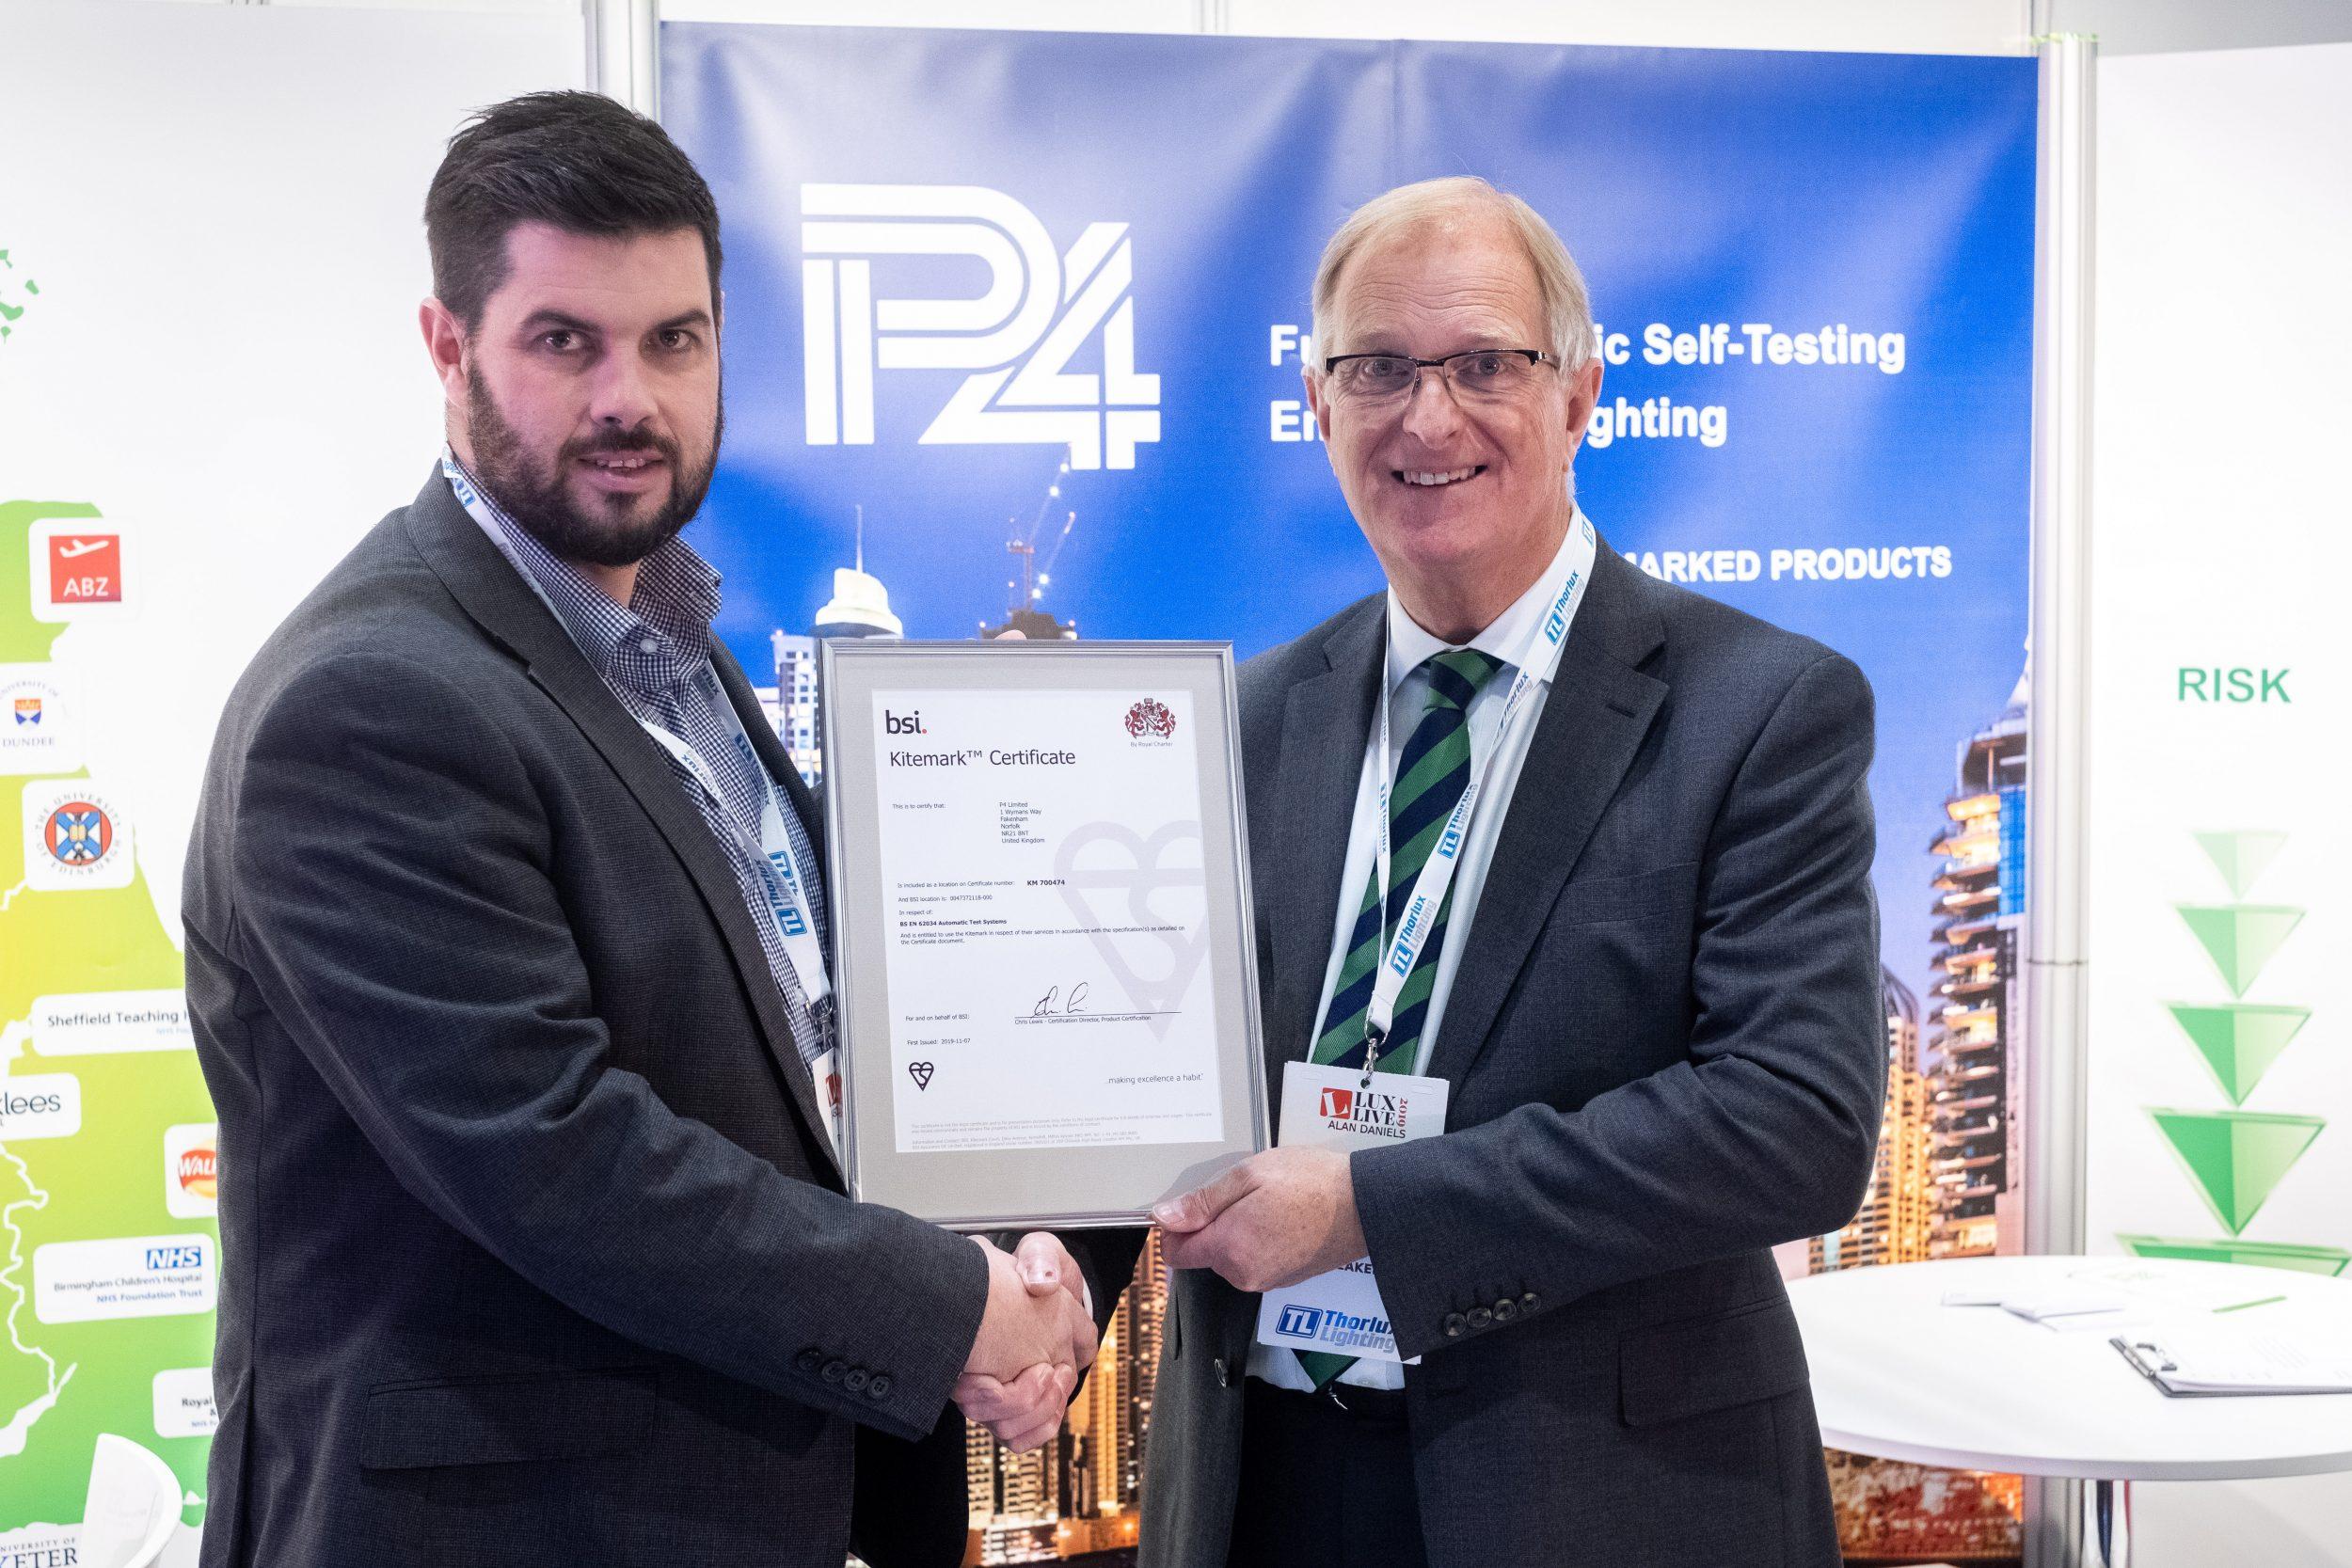 P4 Achieves BSI Kitemark Certification For Emergency Escape Lighting